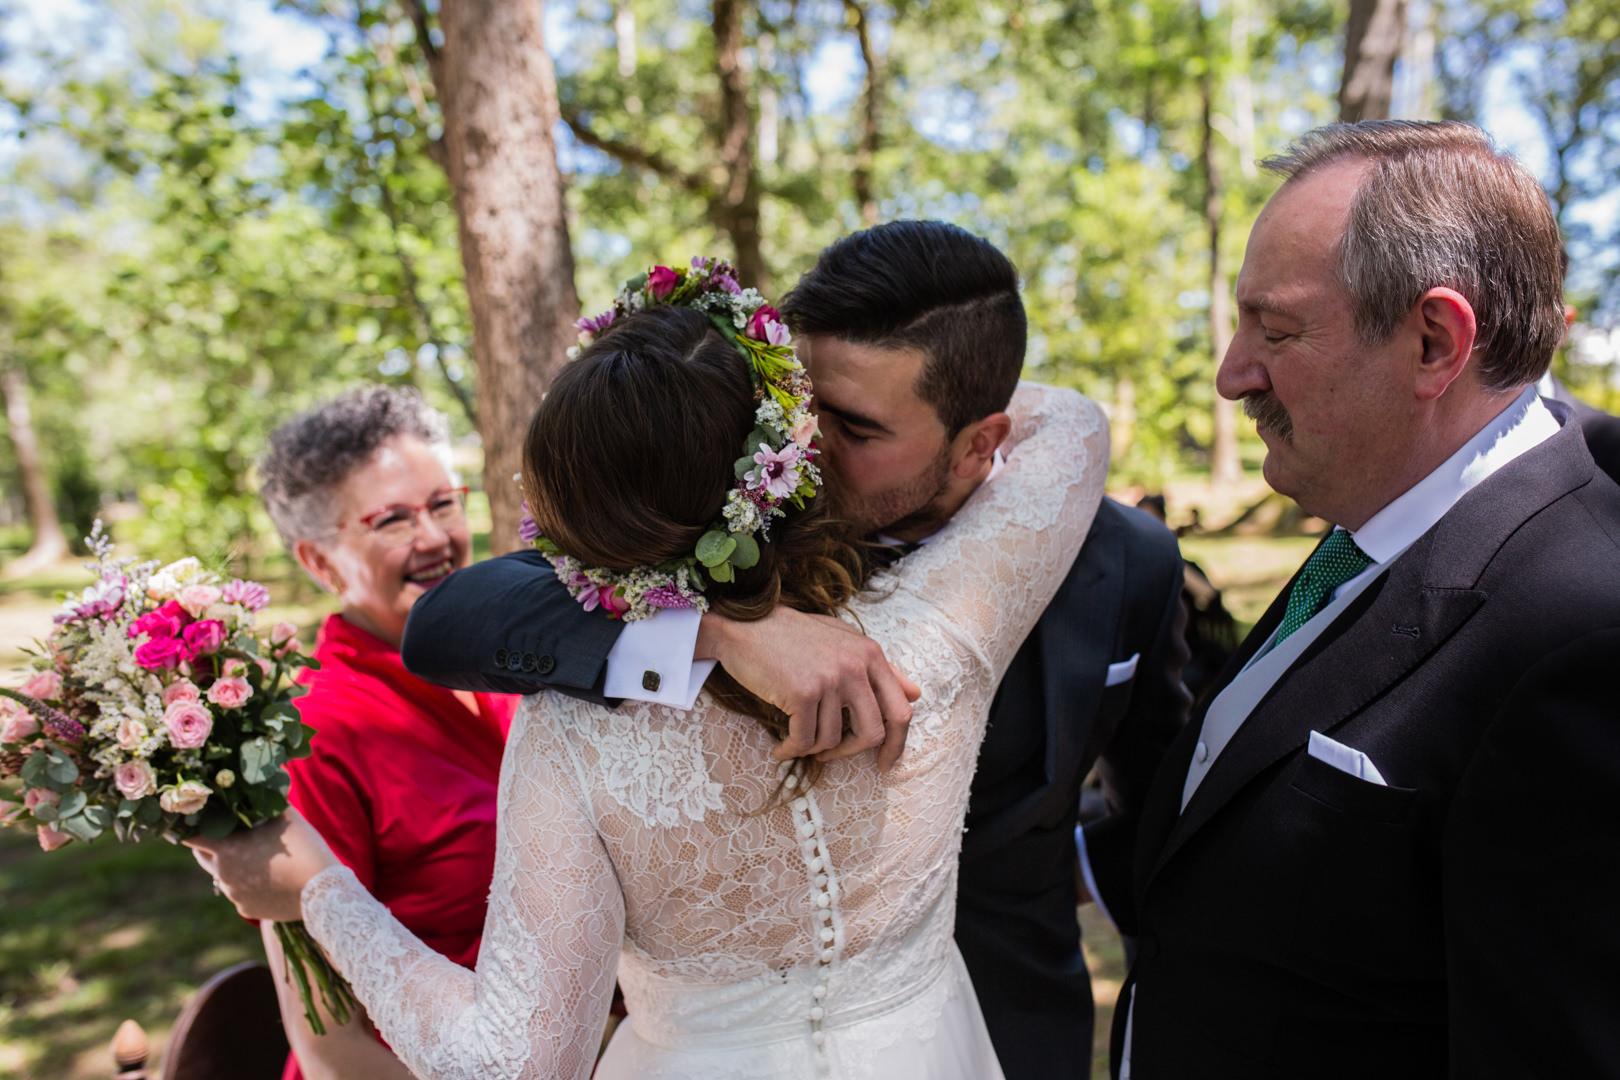 Boda-Lucia-Javi-Lugo-Rafael-Torres-fotografo-bodas-sevilla-madrid-barcelona-wedding-photographer--21.jpg